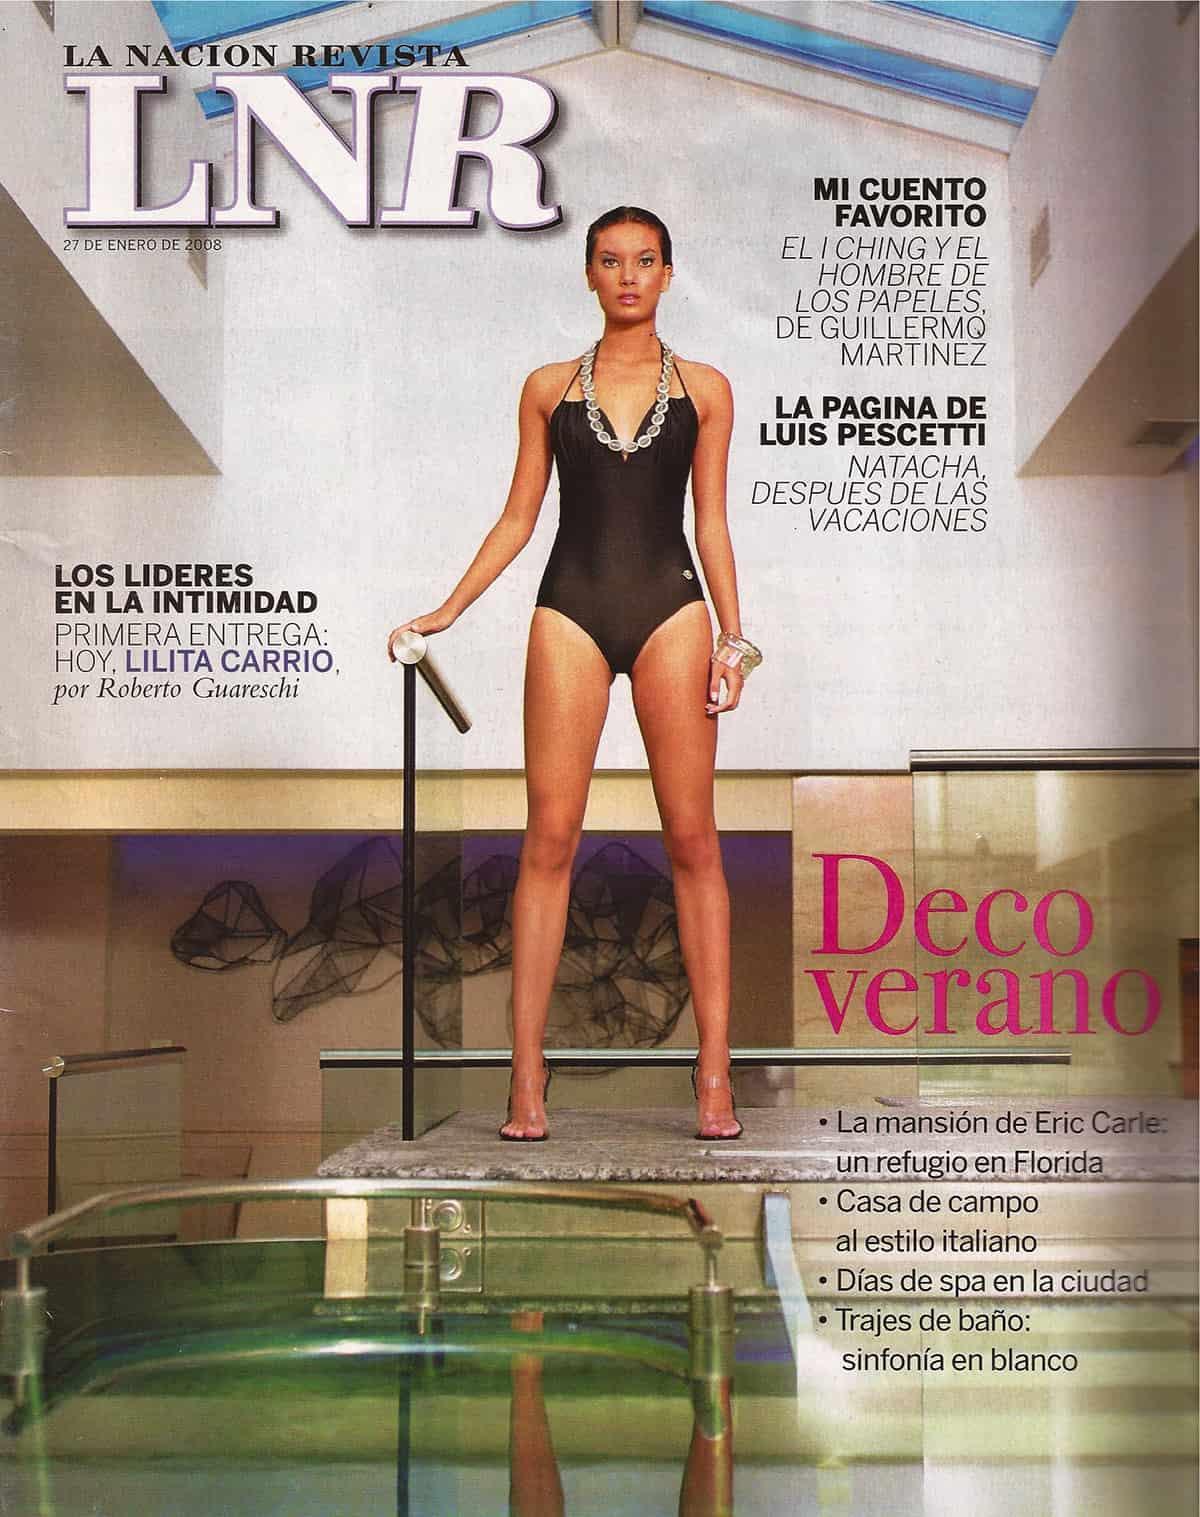 La Nacion Revista 01-2008 – 01